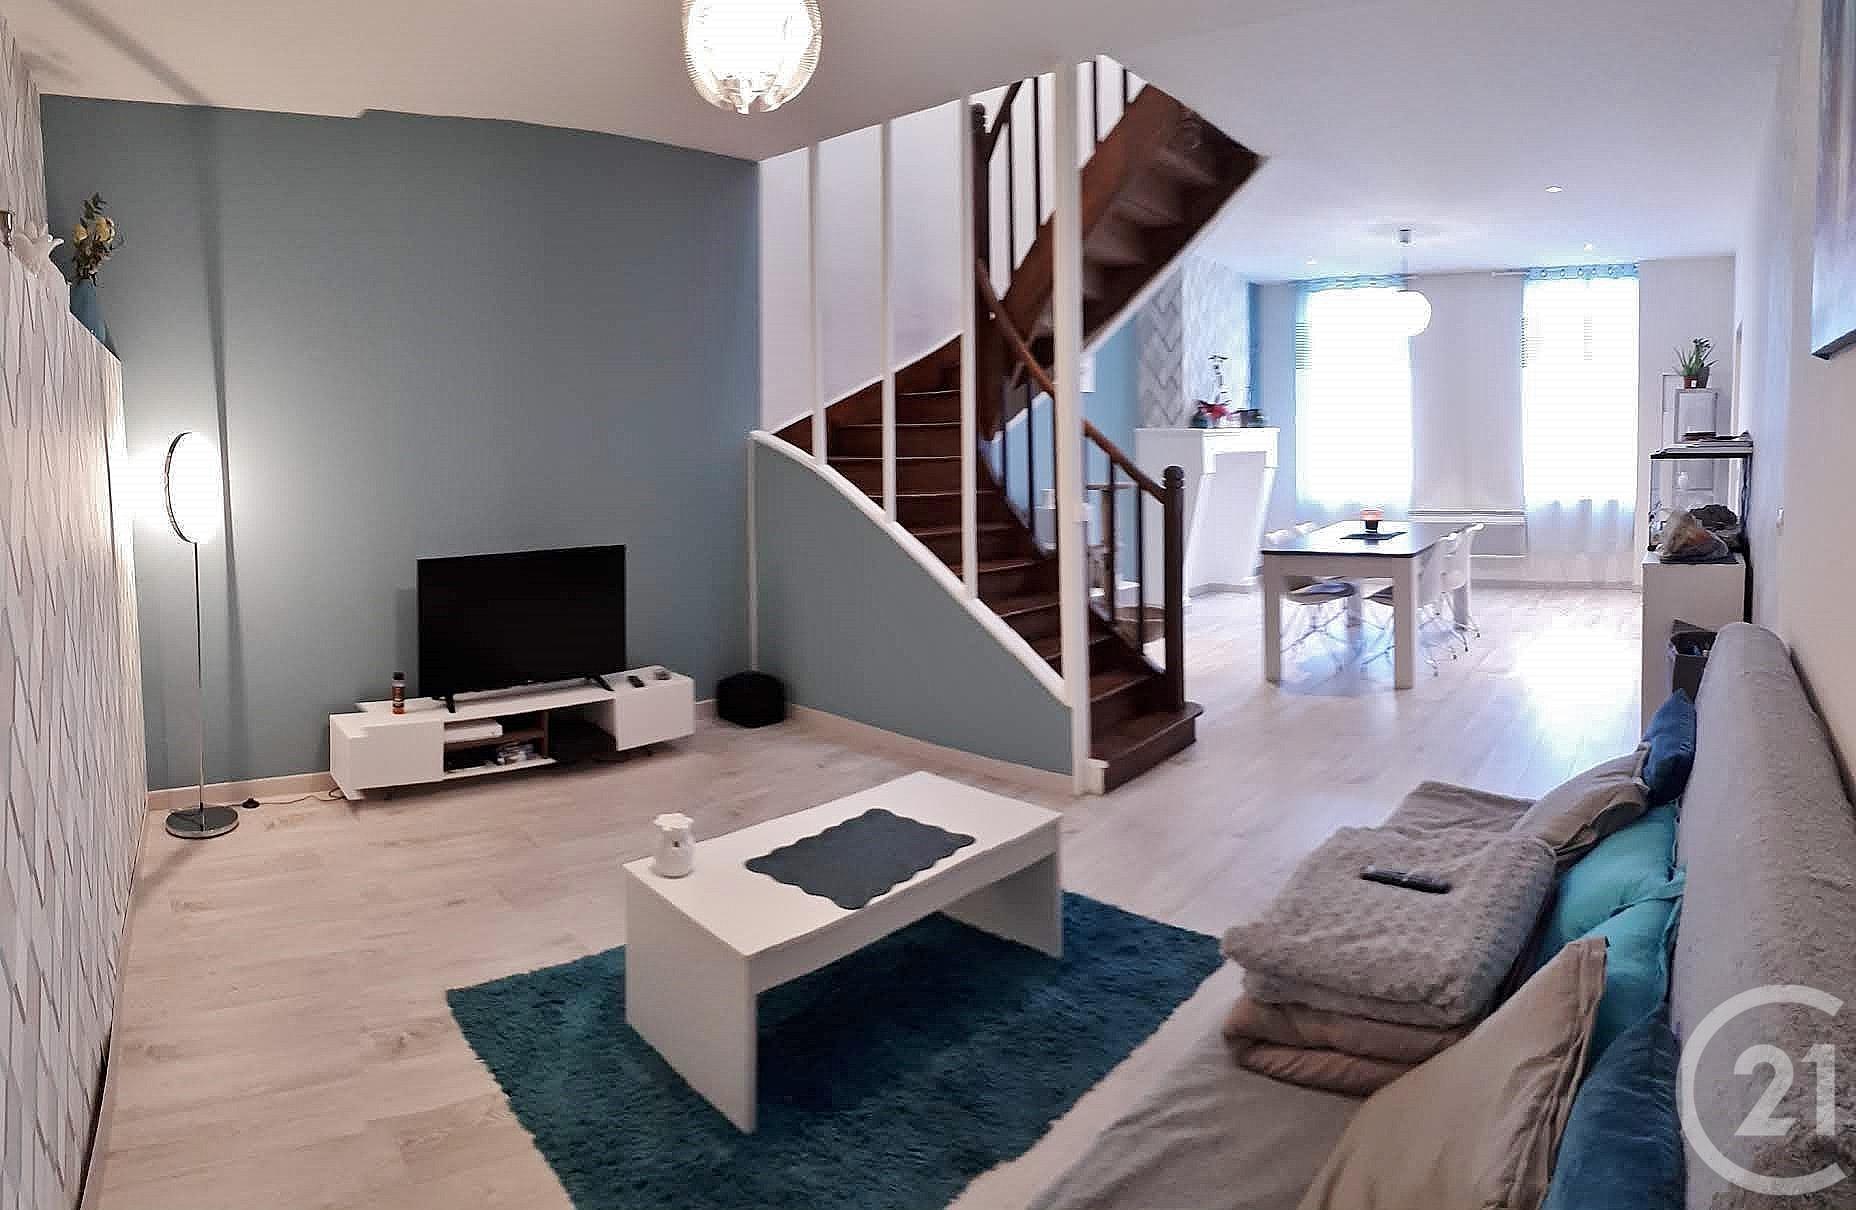 maison 8 pi ces vendre coutras 33230 ref 9124 century 21. Black Bedroom Furniture Sets. Home Design Ideas